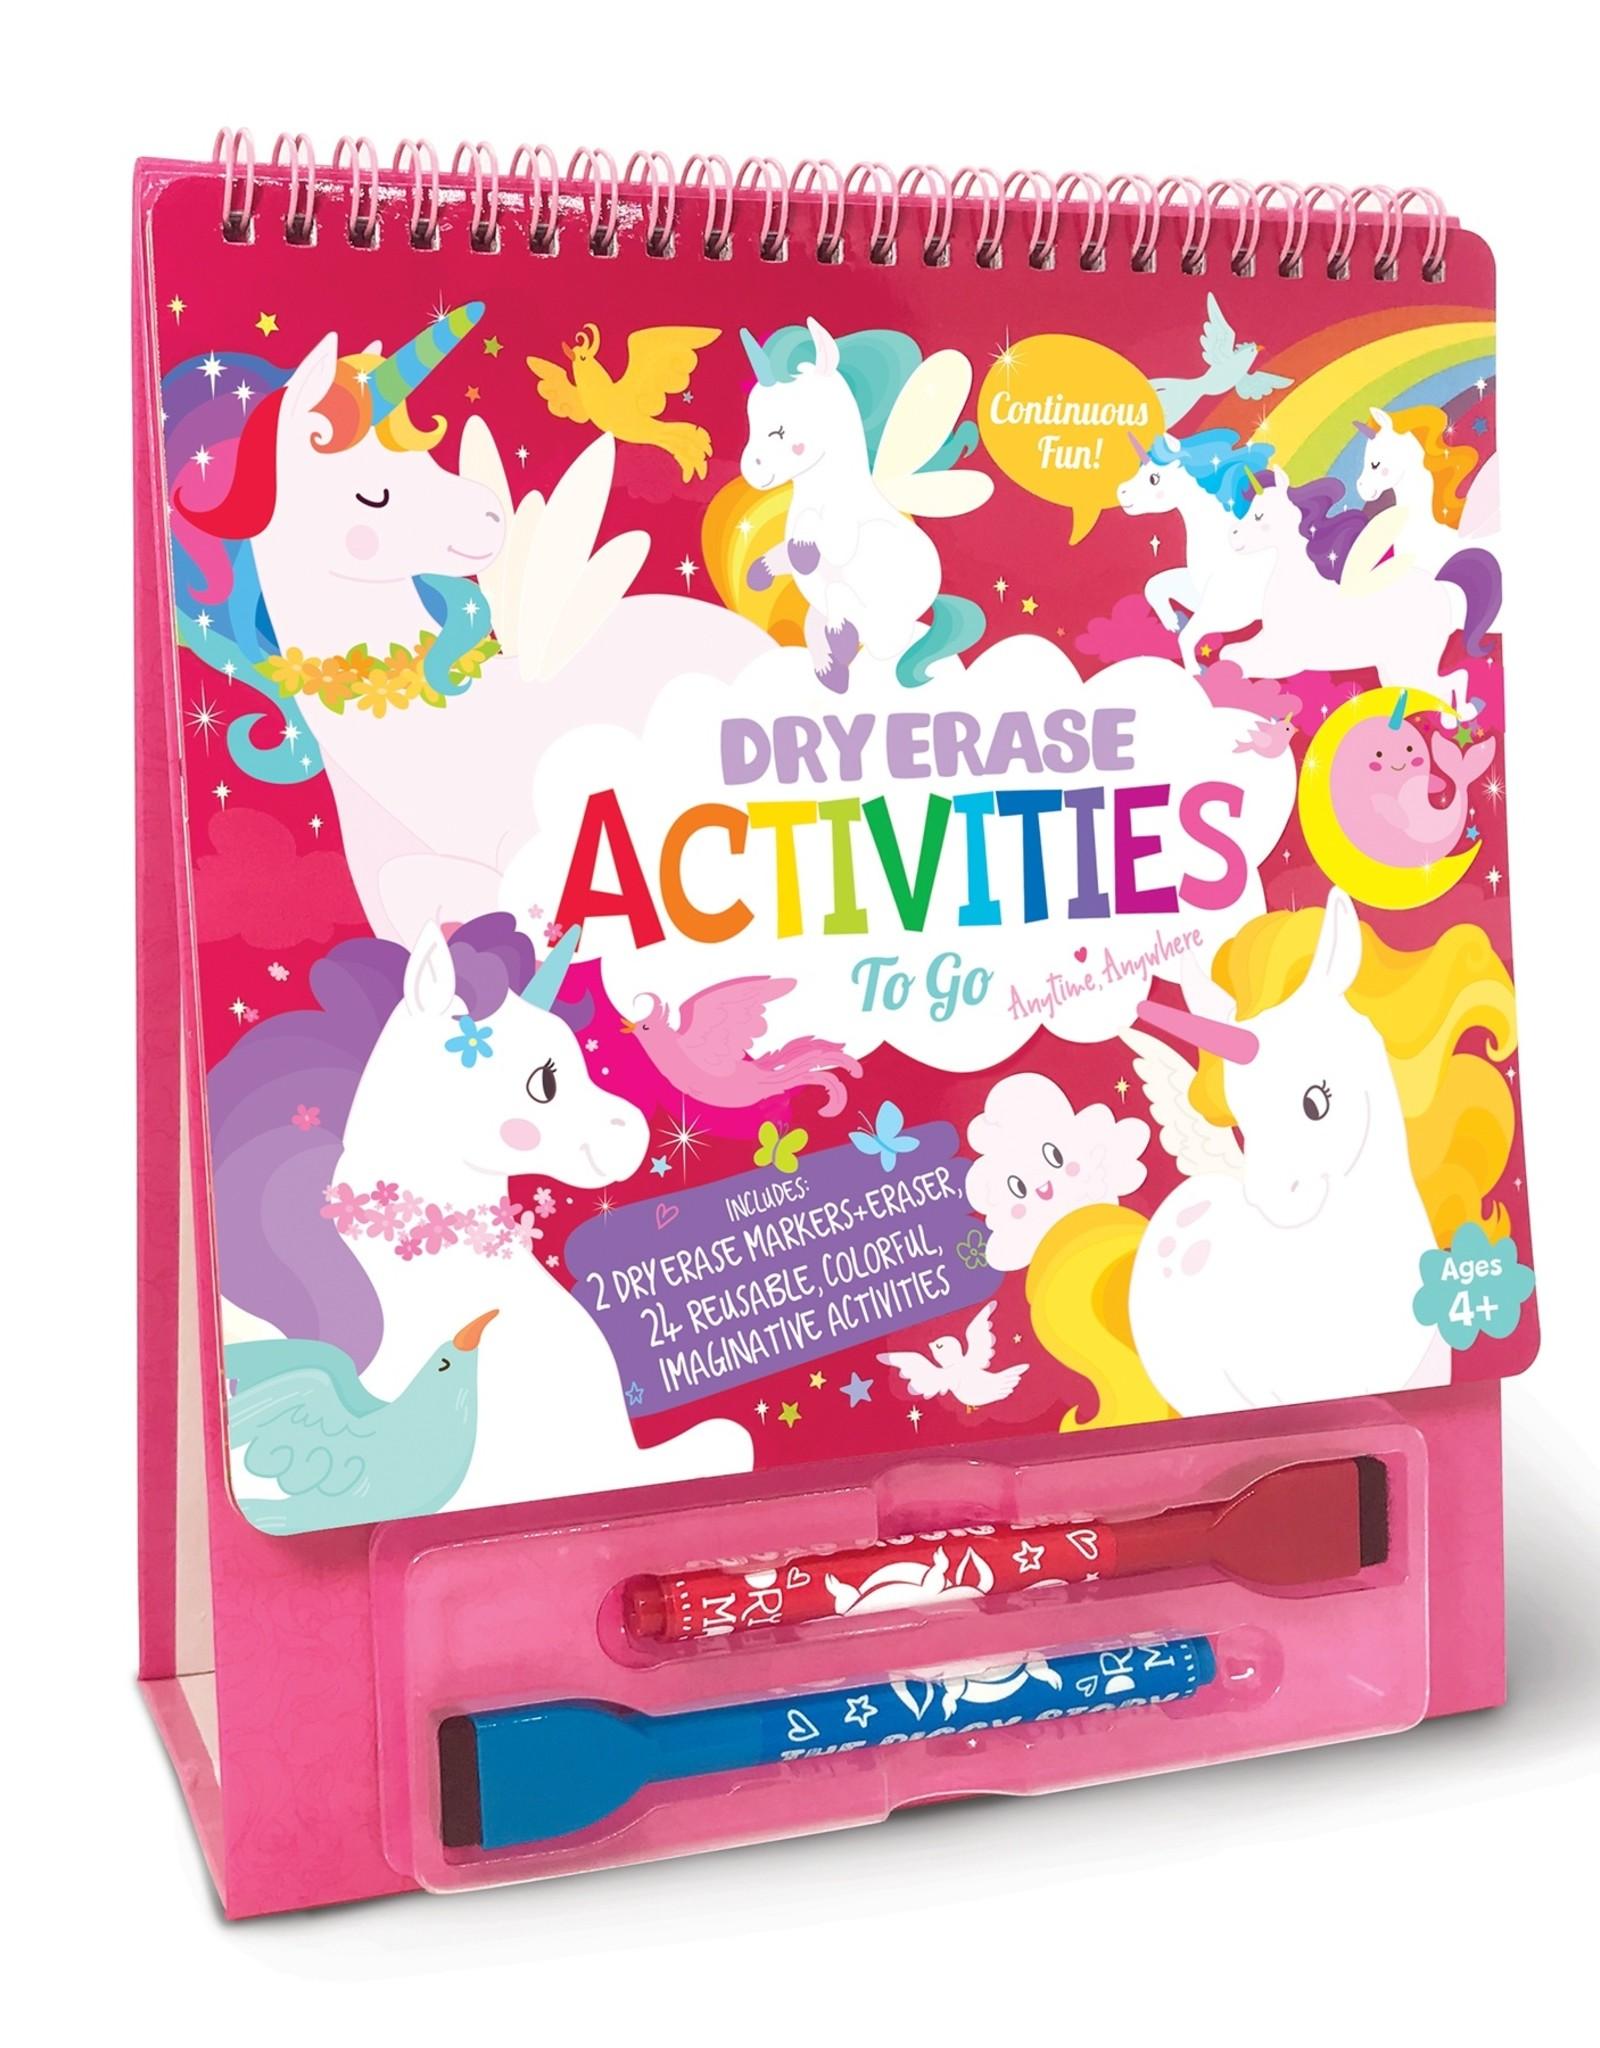 Dry Erase Activities To Go